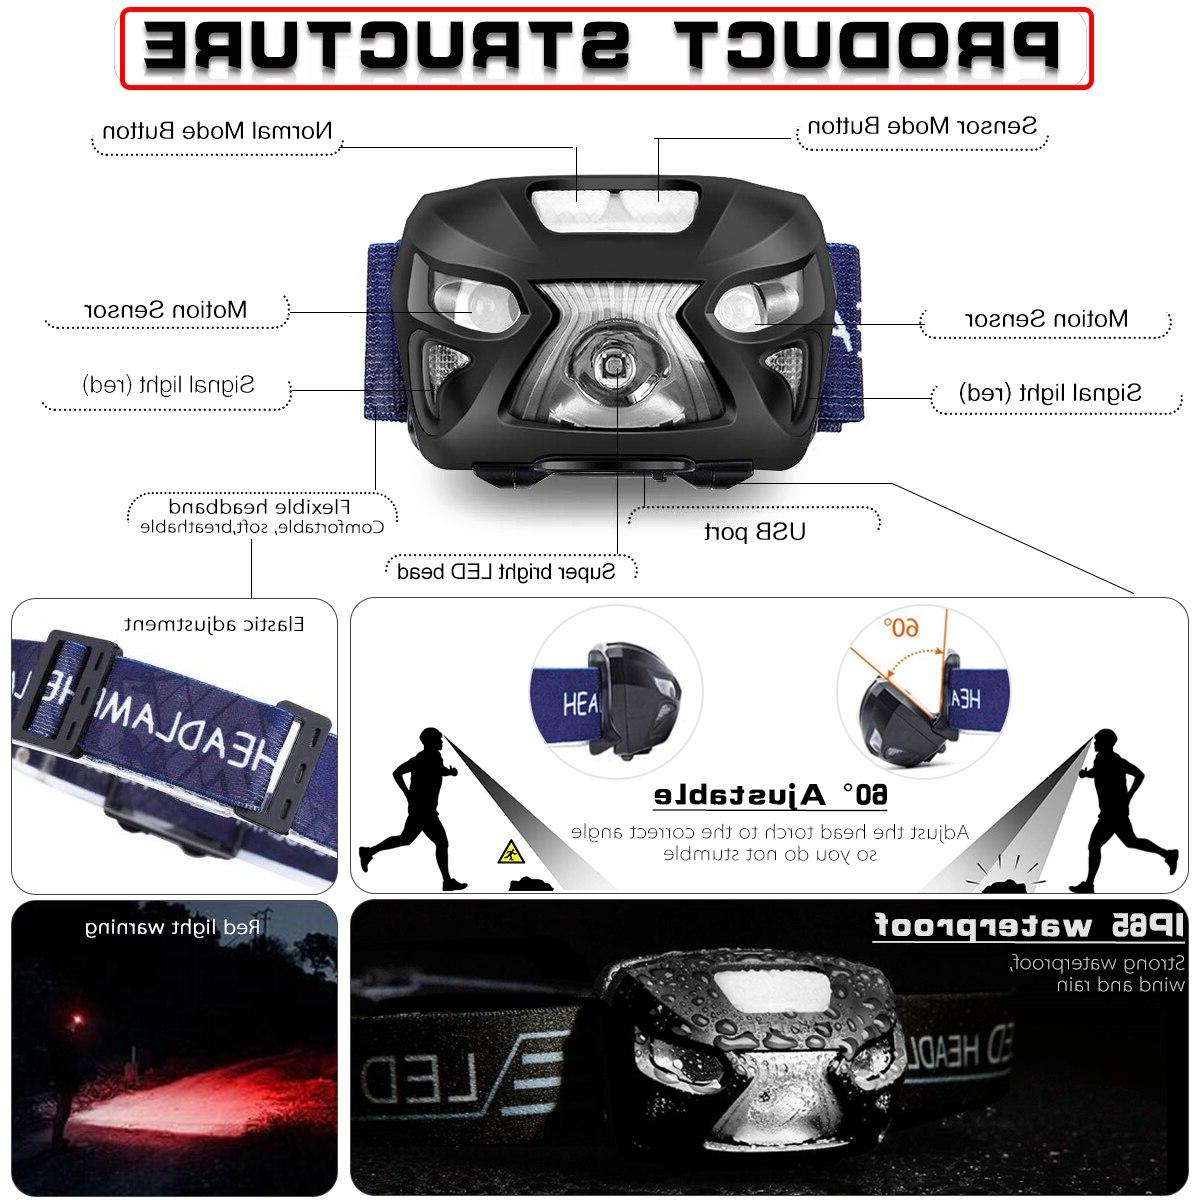 7000Lm <font><b>LED</b></font> Headlight Body Sensor Head Flashlight Torch Light Lamp USB